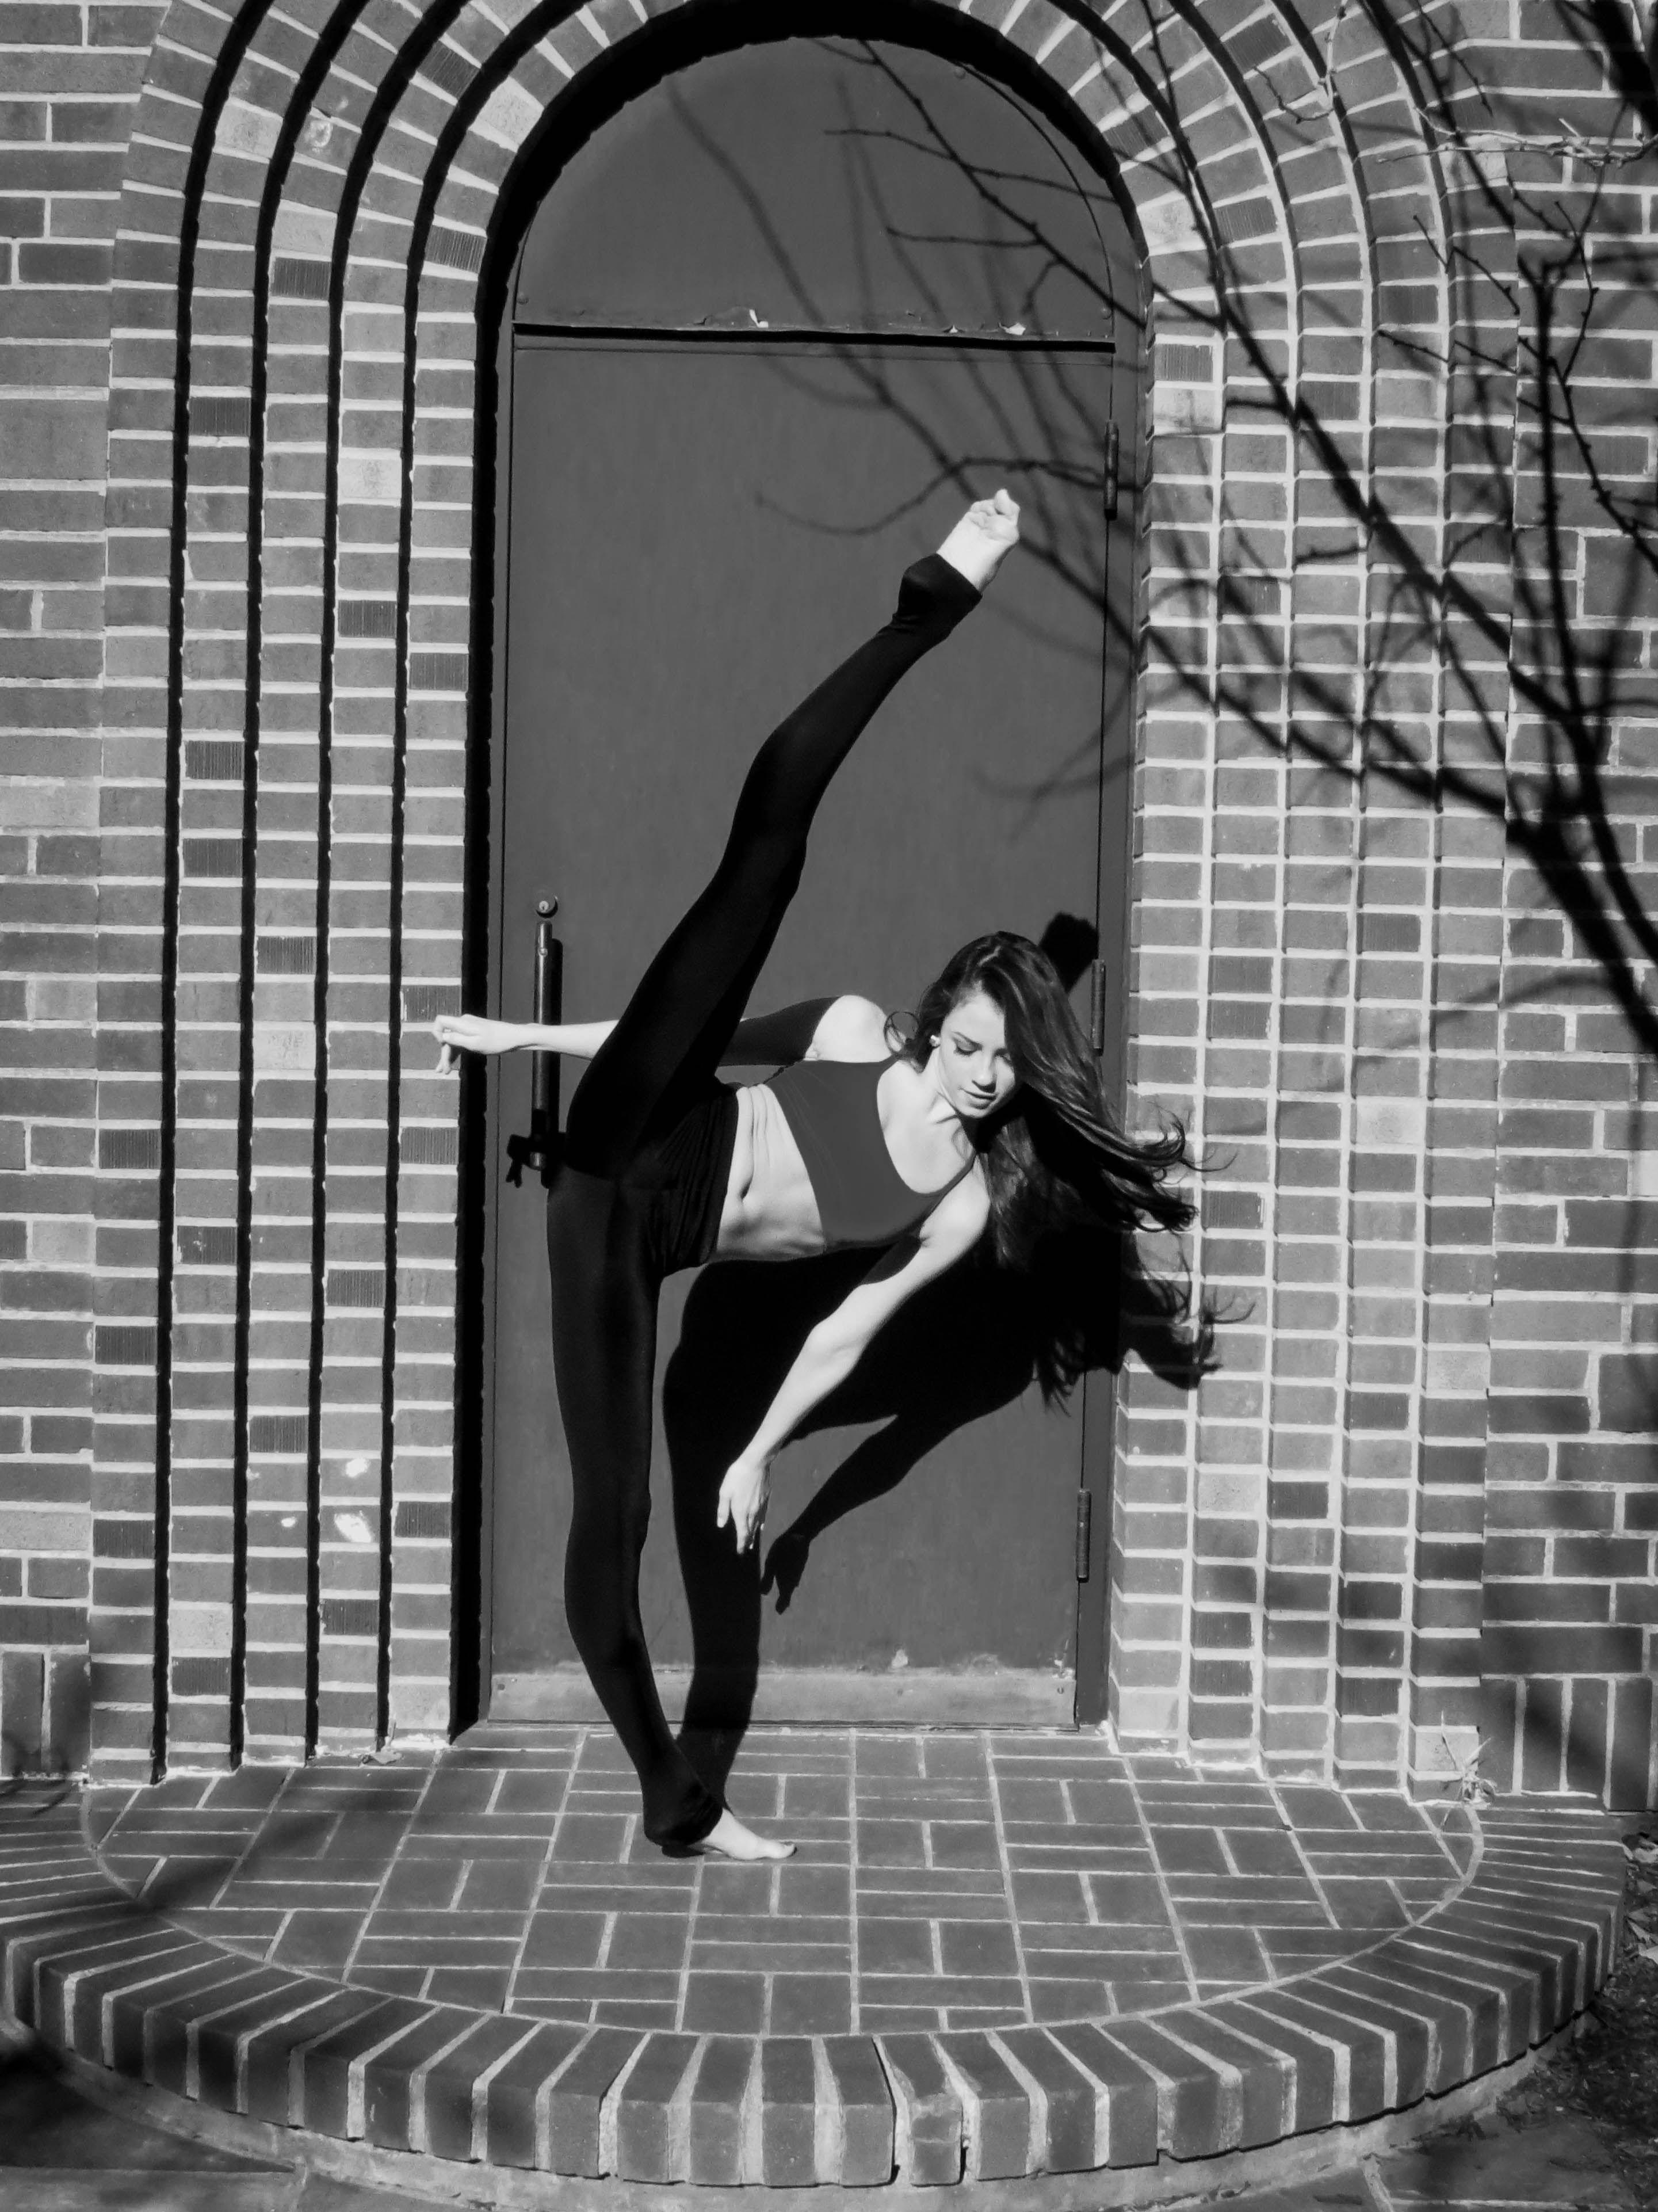 Dance Tilt Tumblr | www.imgkid.com - The Image Kid Has It!